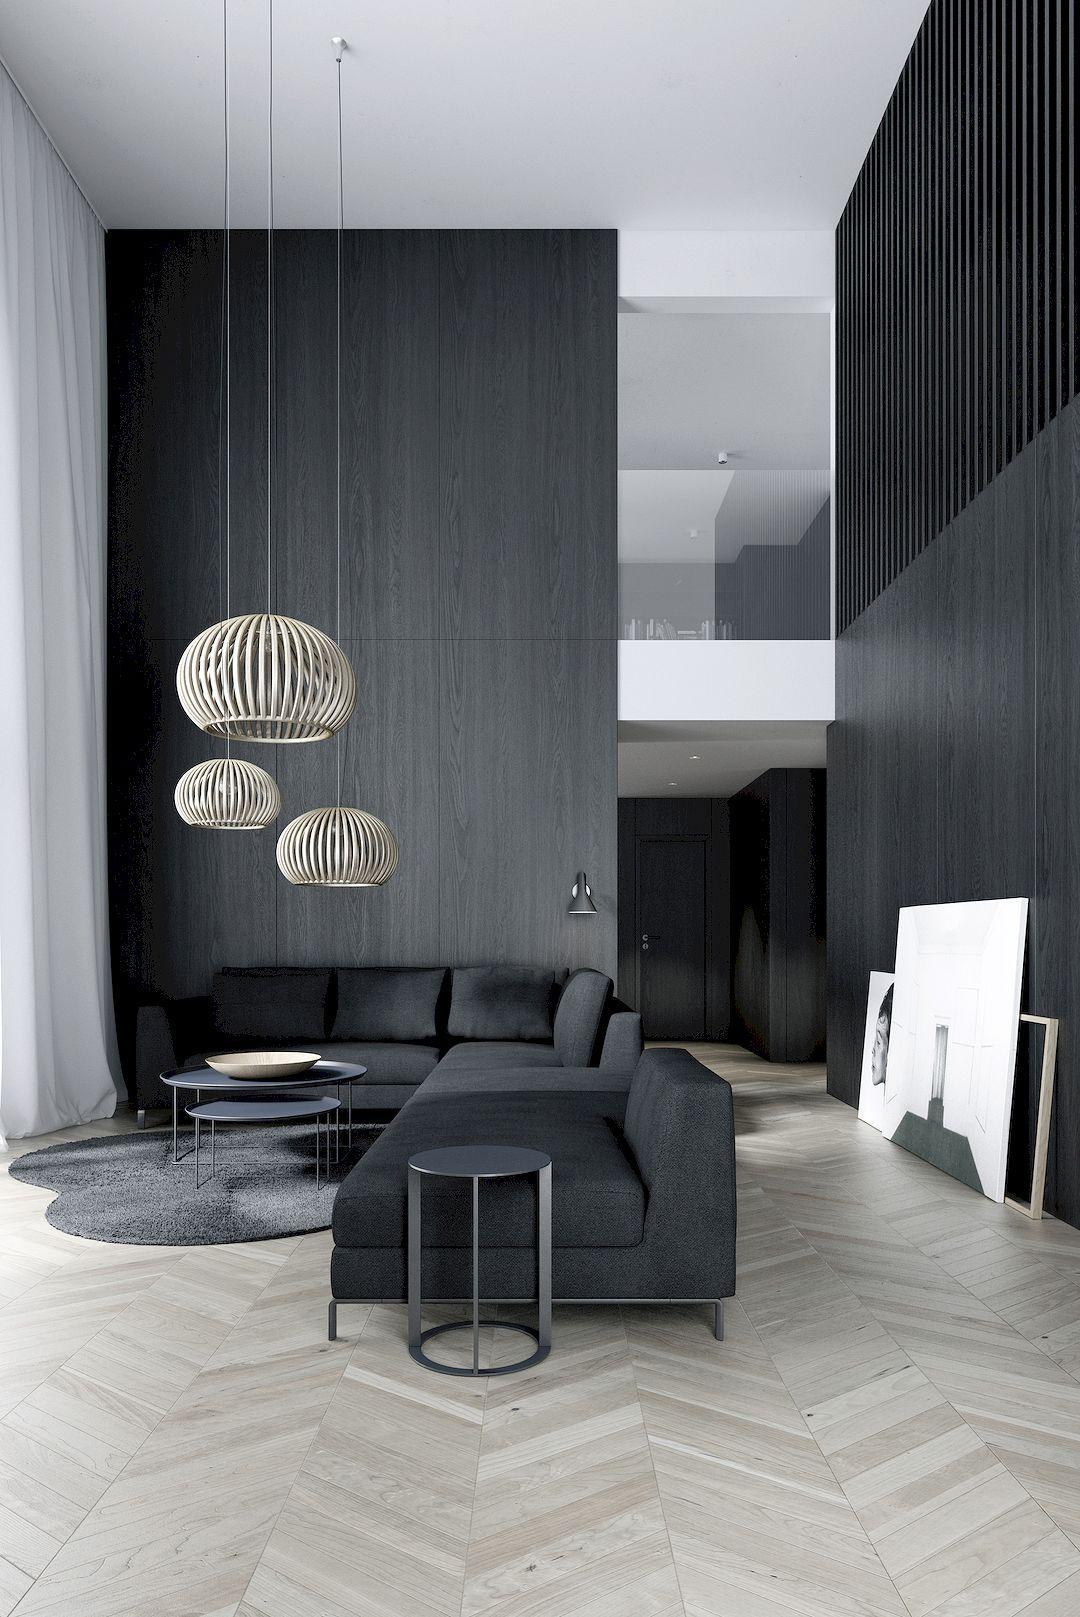 Beau Best Interior Design Inspirations 2017 (155 Photos) |